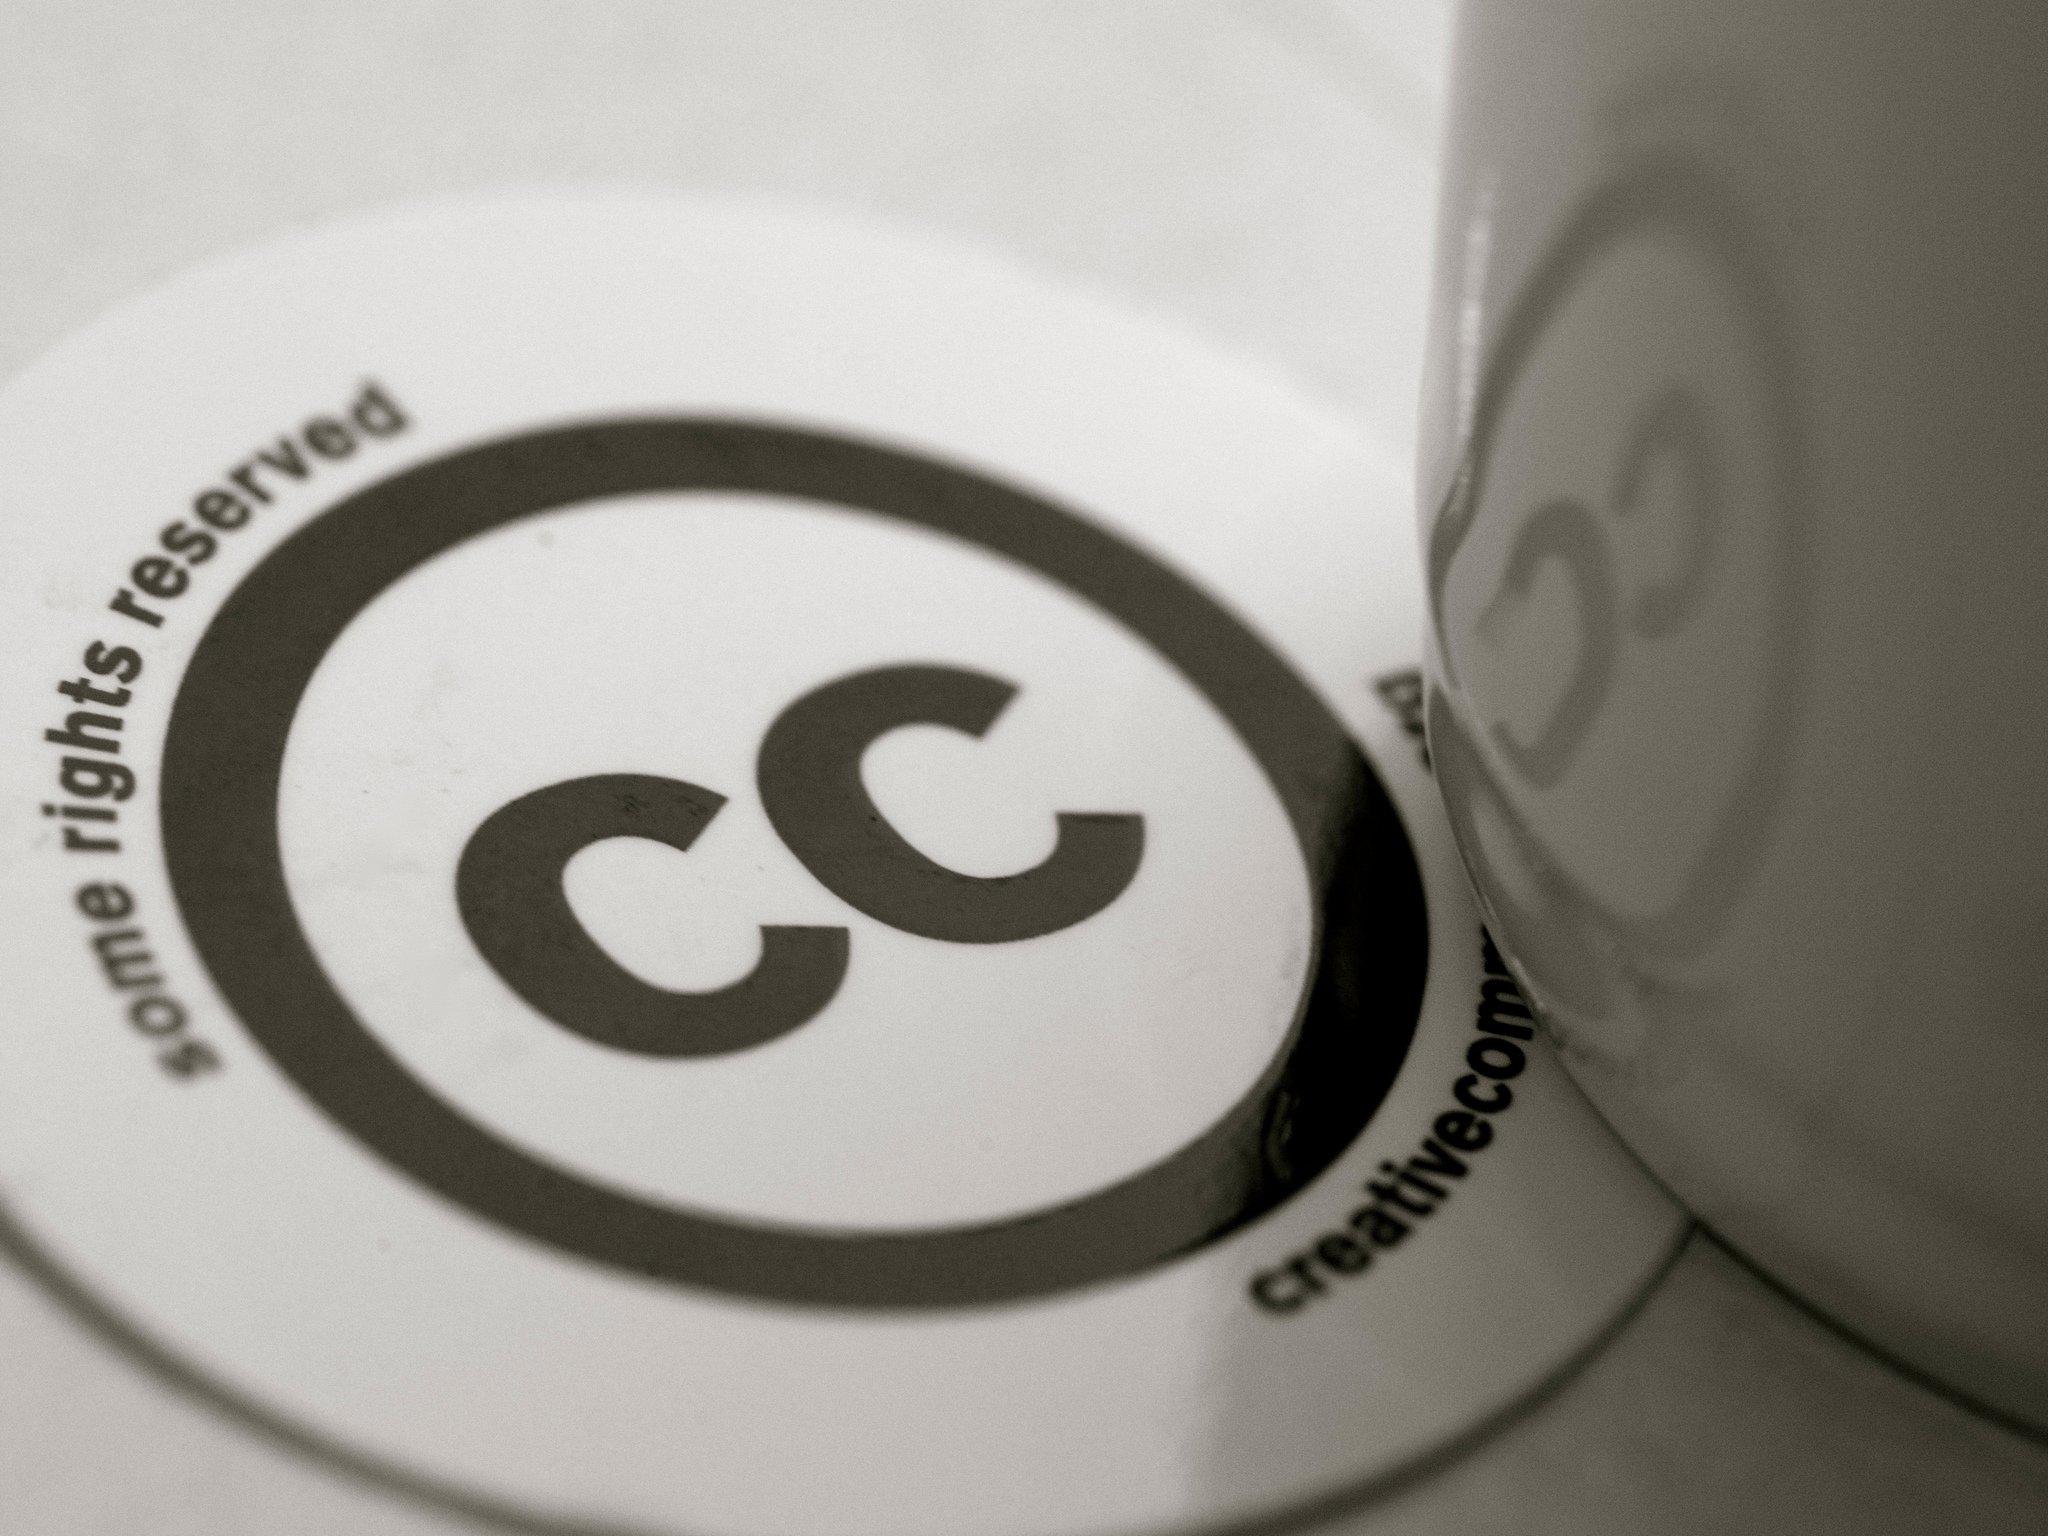 CC-Lizenzen regeln das Urheberrecht